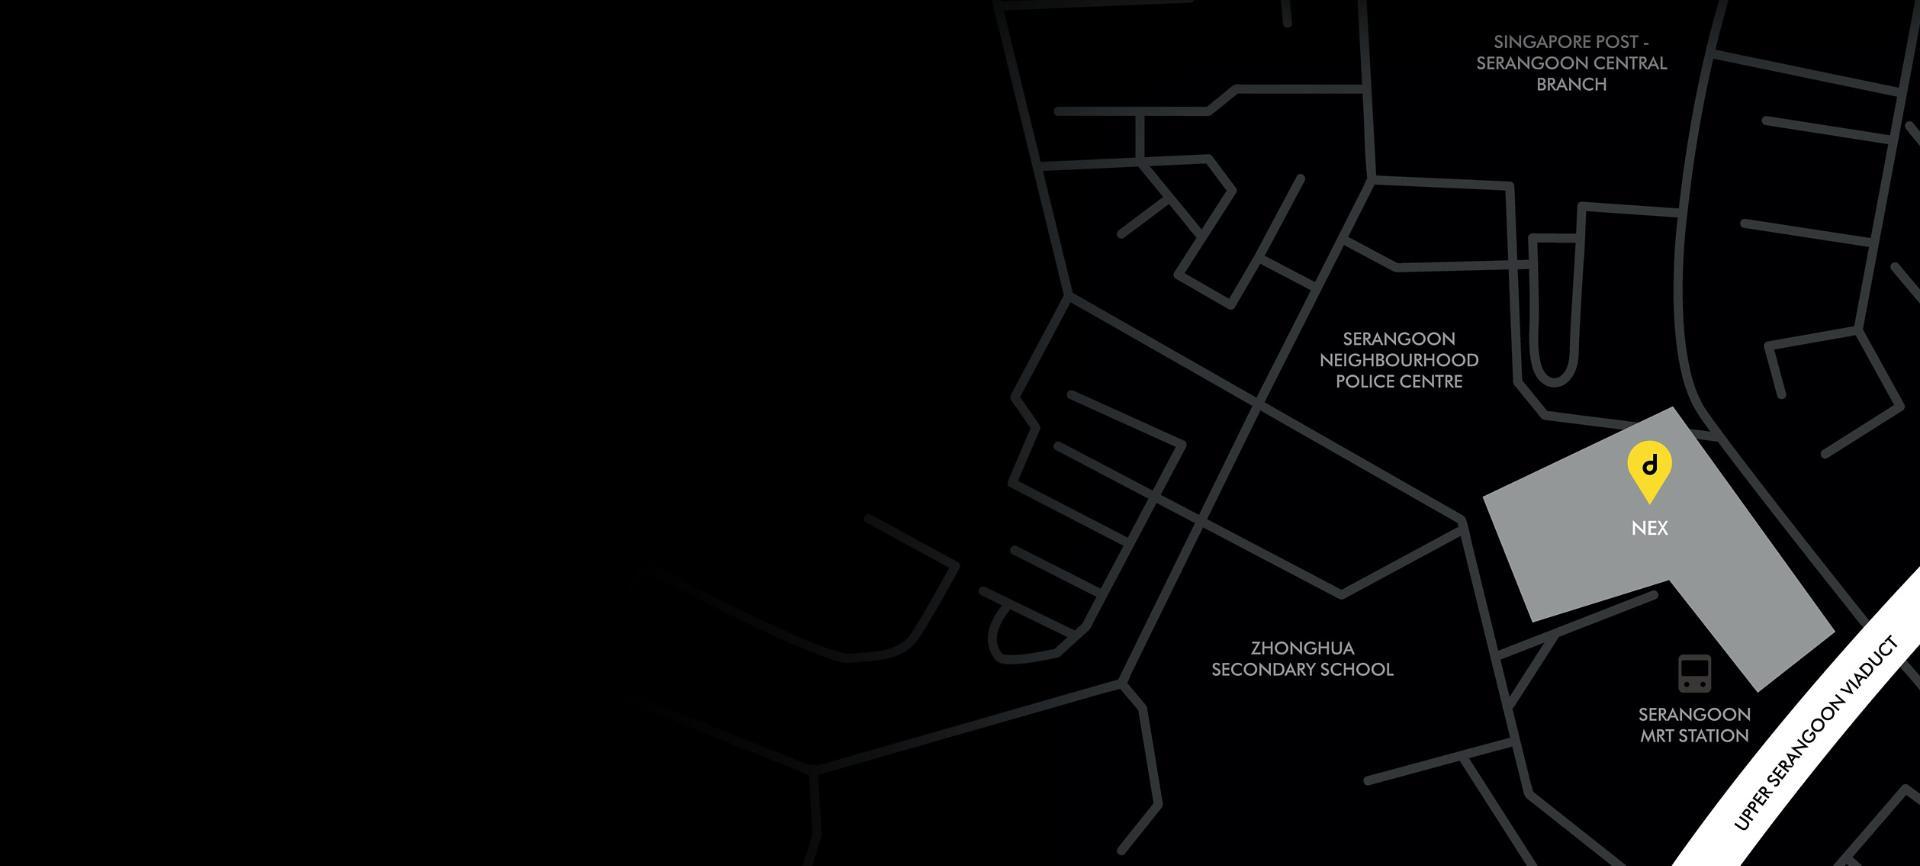 Image of Nex map